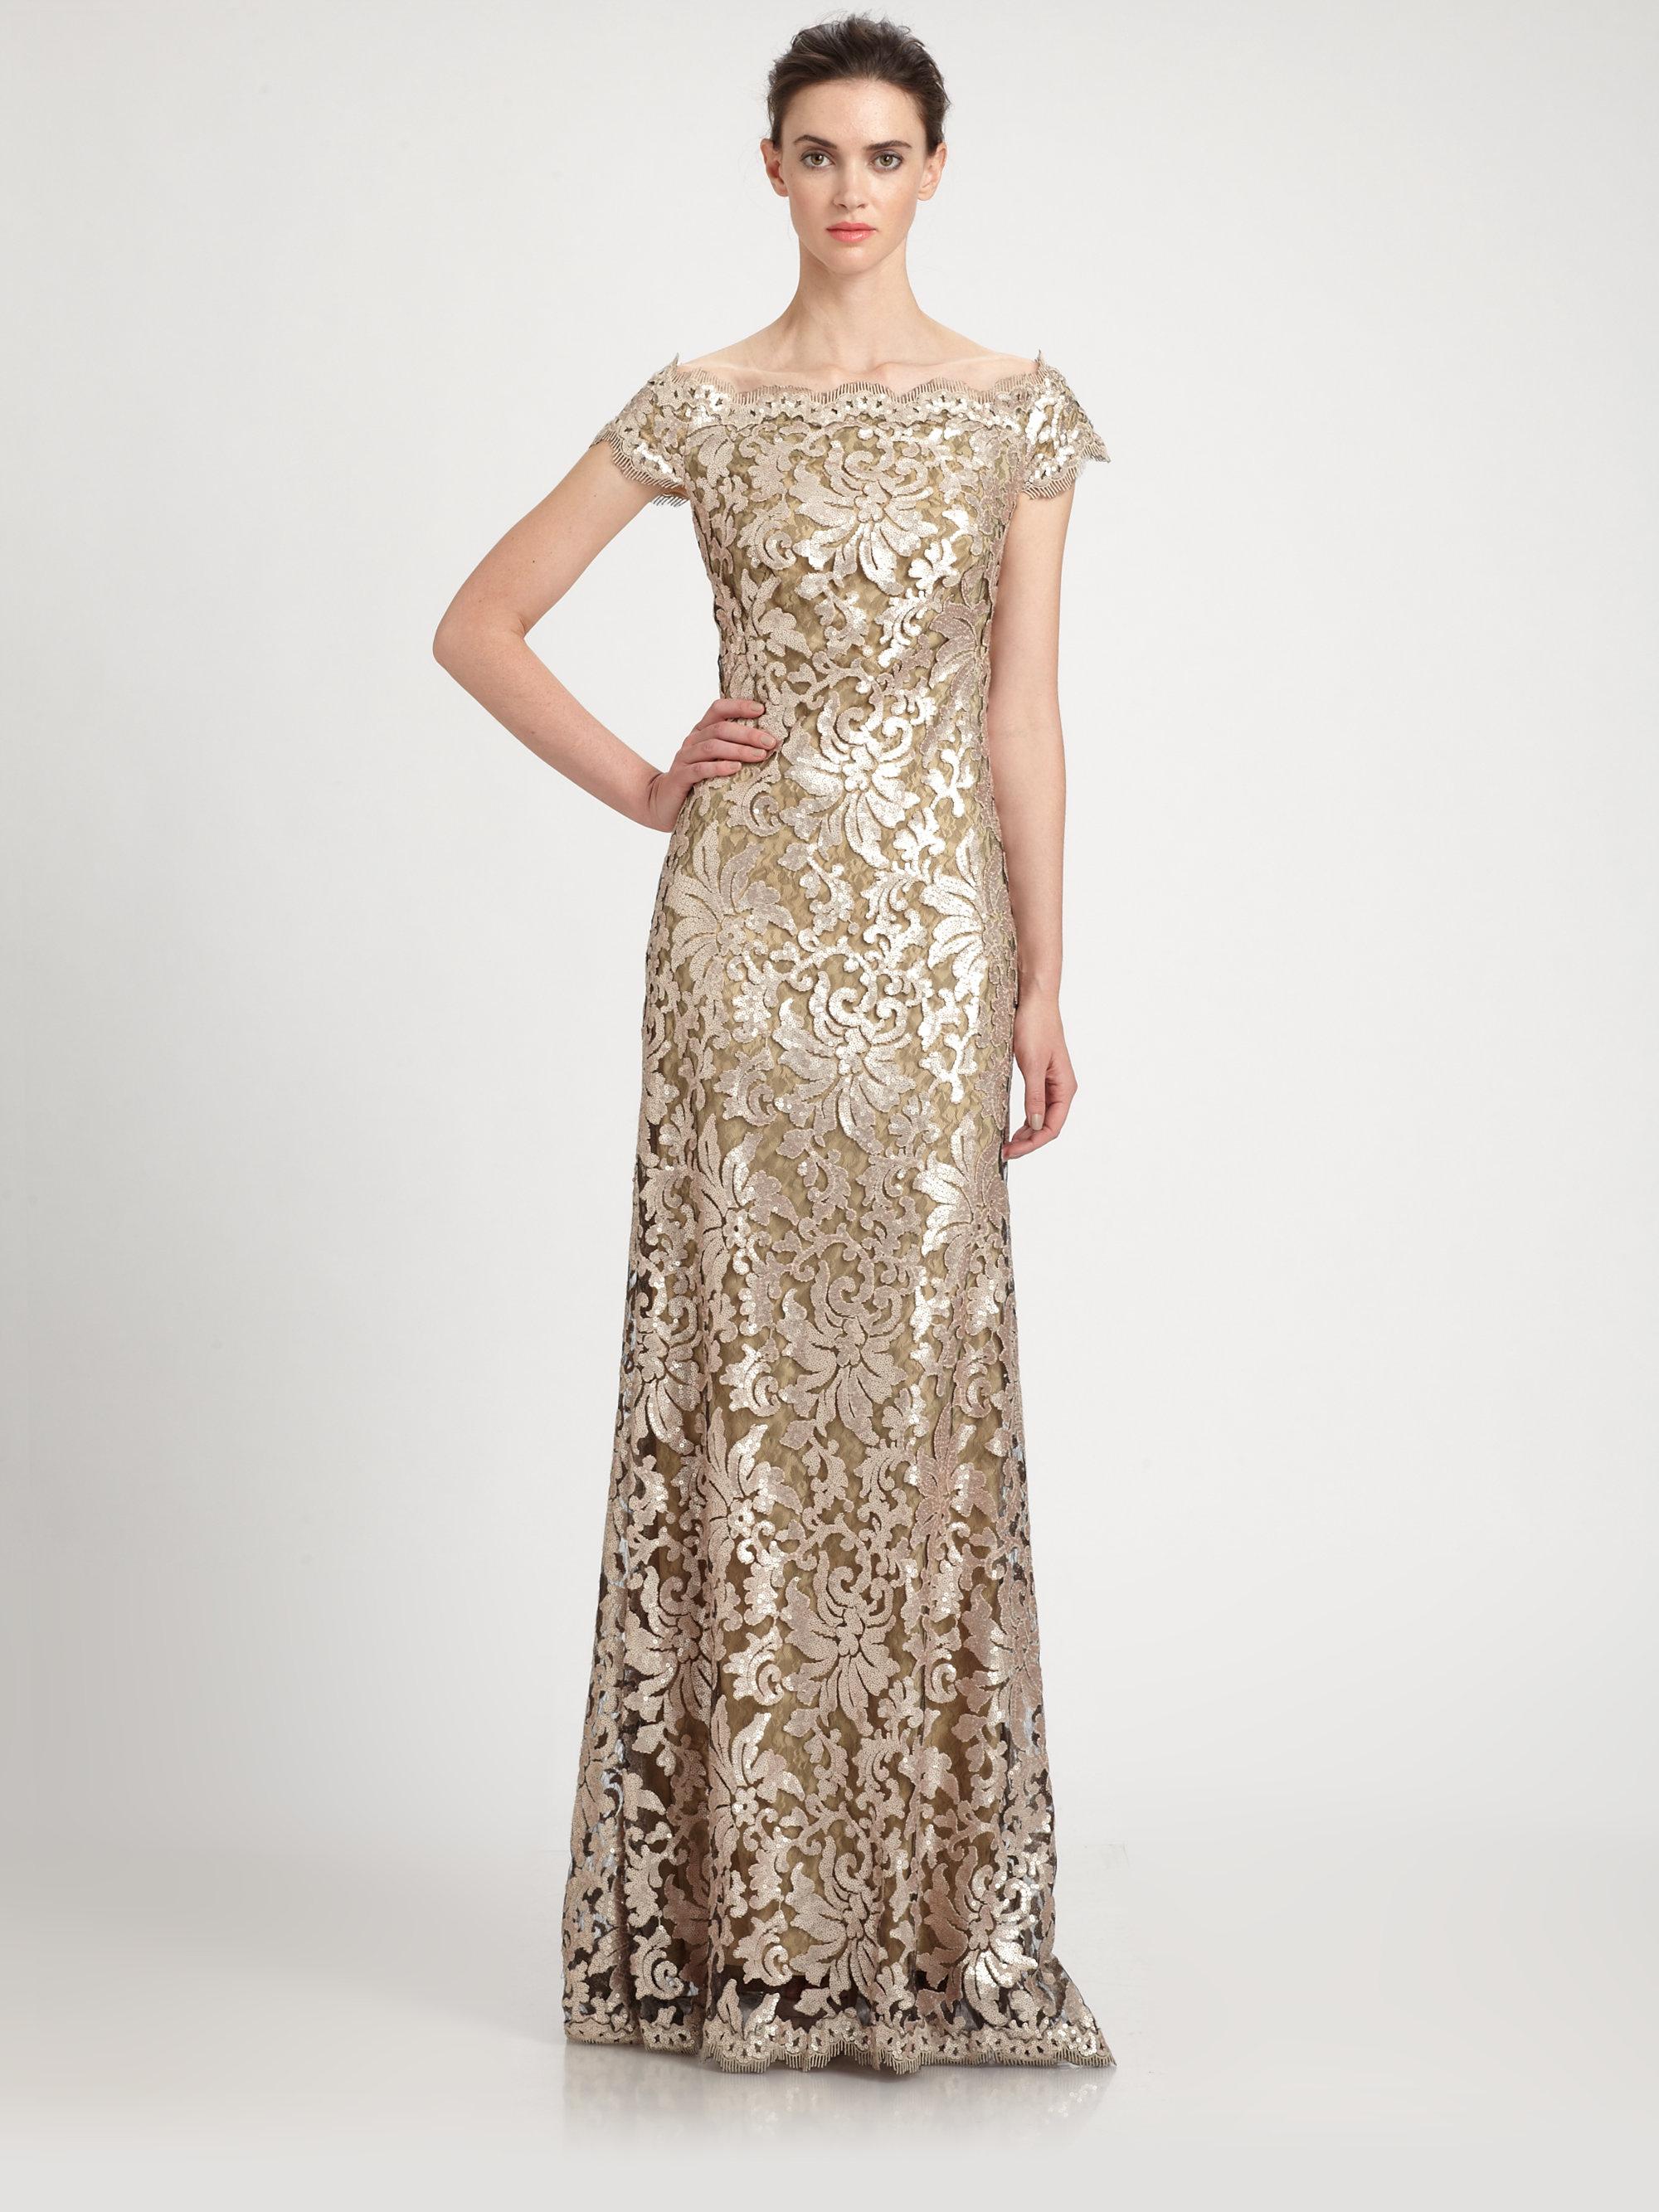 63f2108af27 Tadashi Shoji Offtheshoulder Sequined Lace Gown in Metallic - Lyst